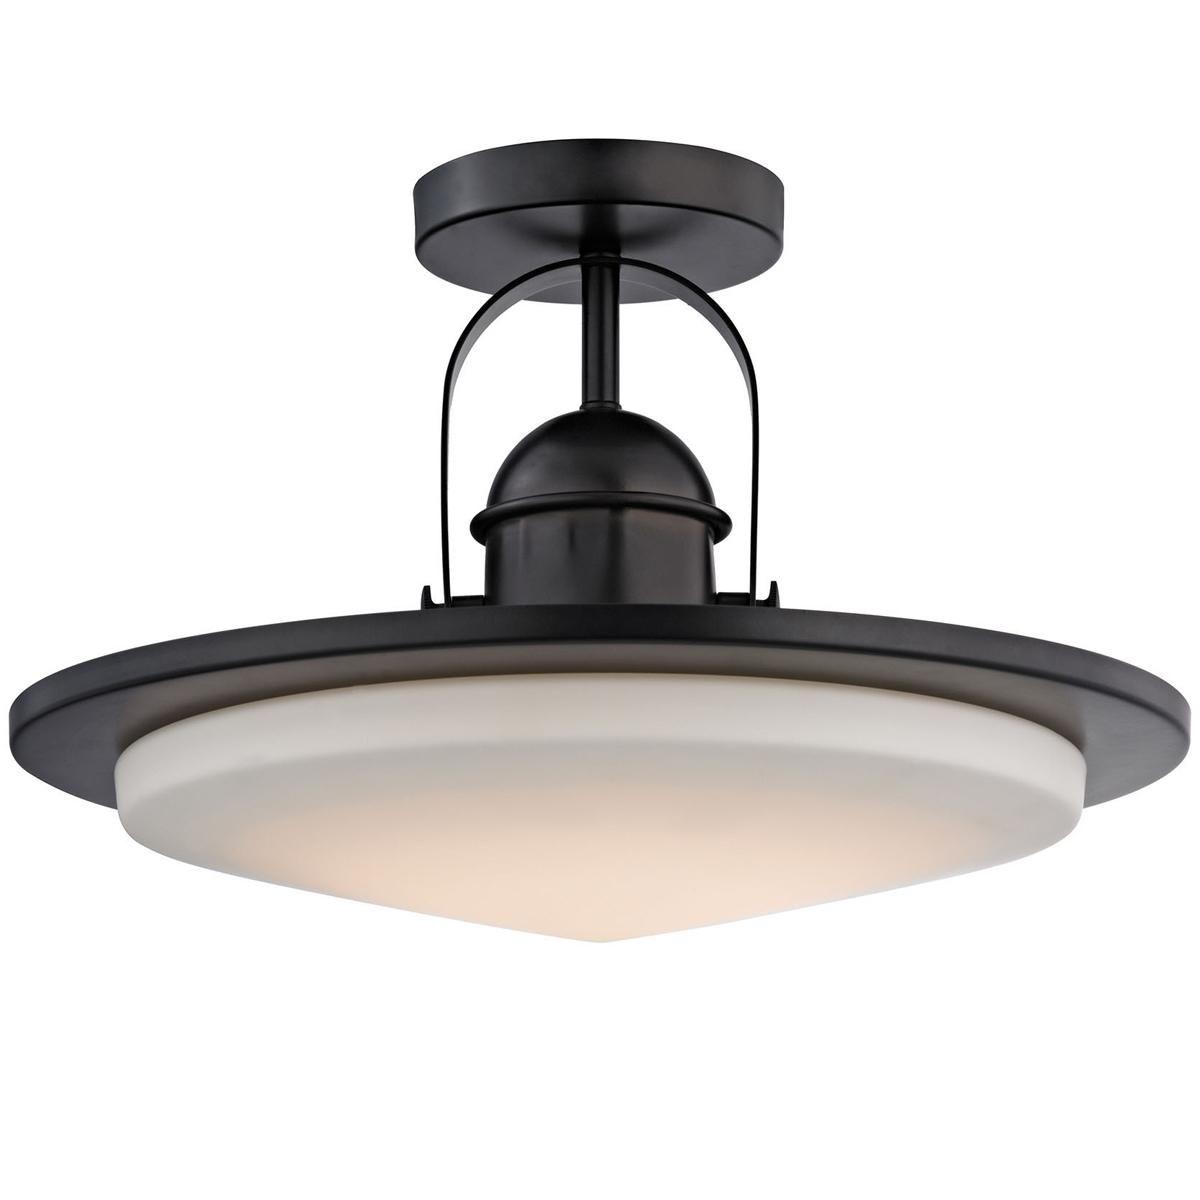 Modern Industrial Minimalist Led Semi Flush Ceiling Light Semi Flush Ceiling Lights Glass Diffuser Flush Ceiling Lights